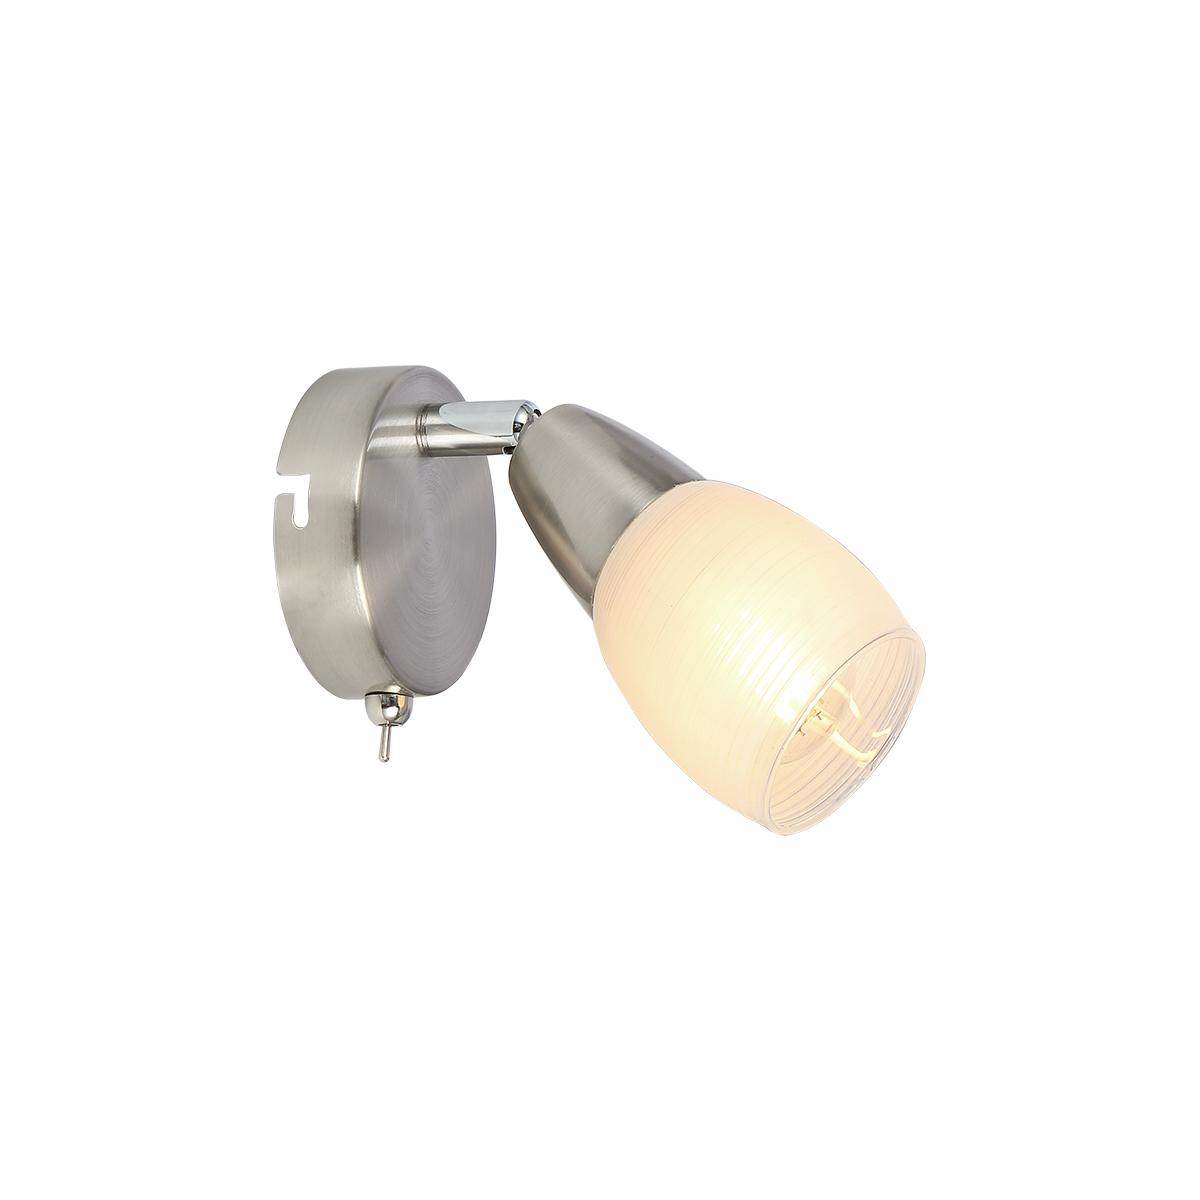 Spot lampa Amaris/1 16600751